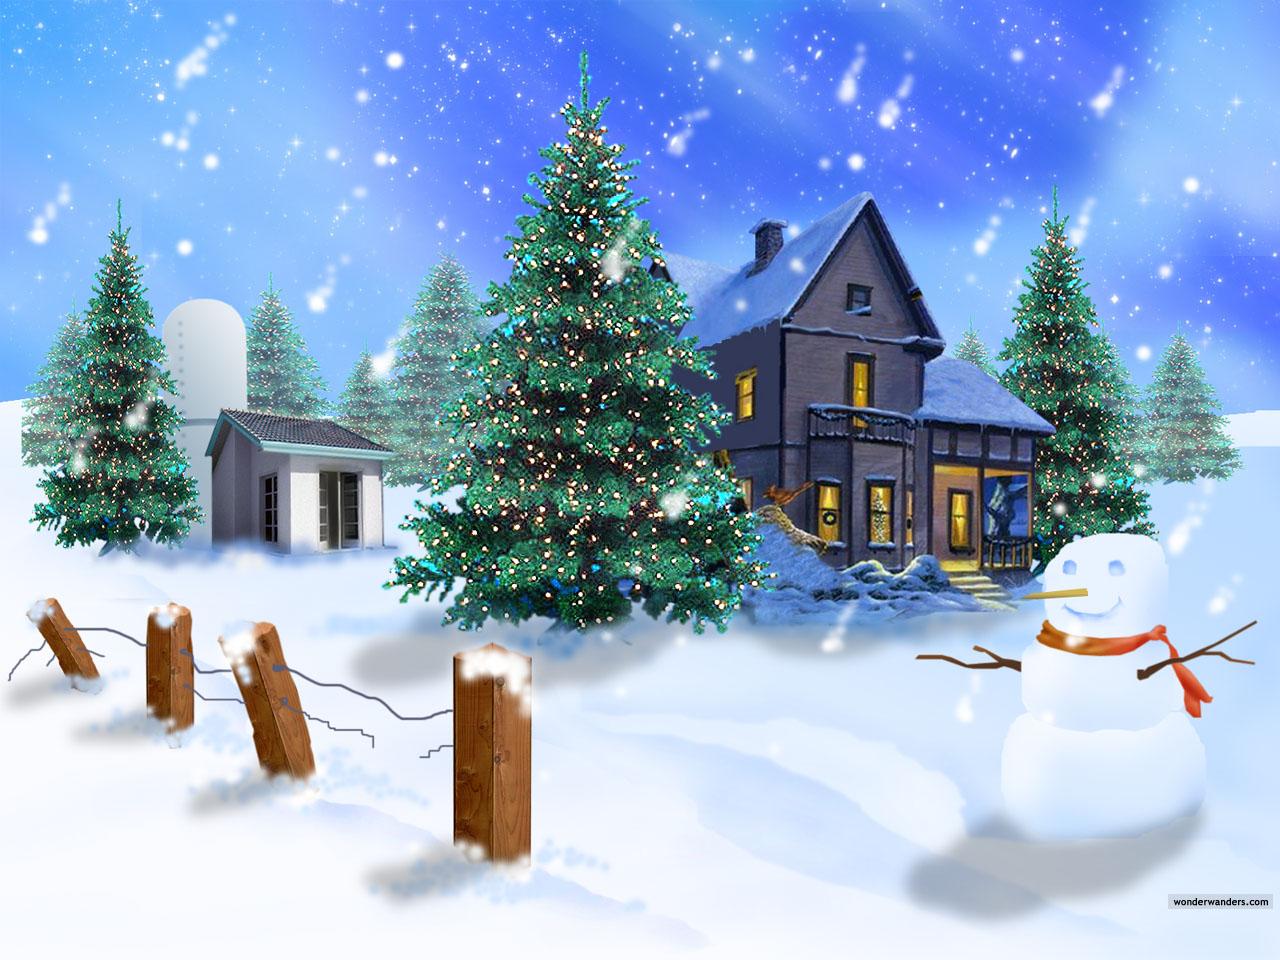 Christmas New Year Wallpaper 185 Desktop Wallpapers 1280x960